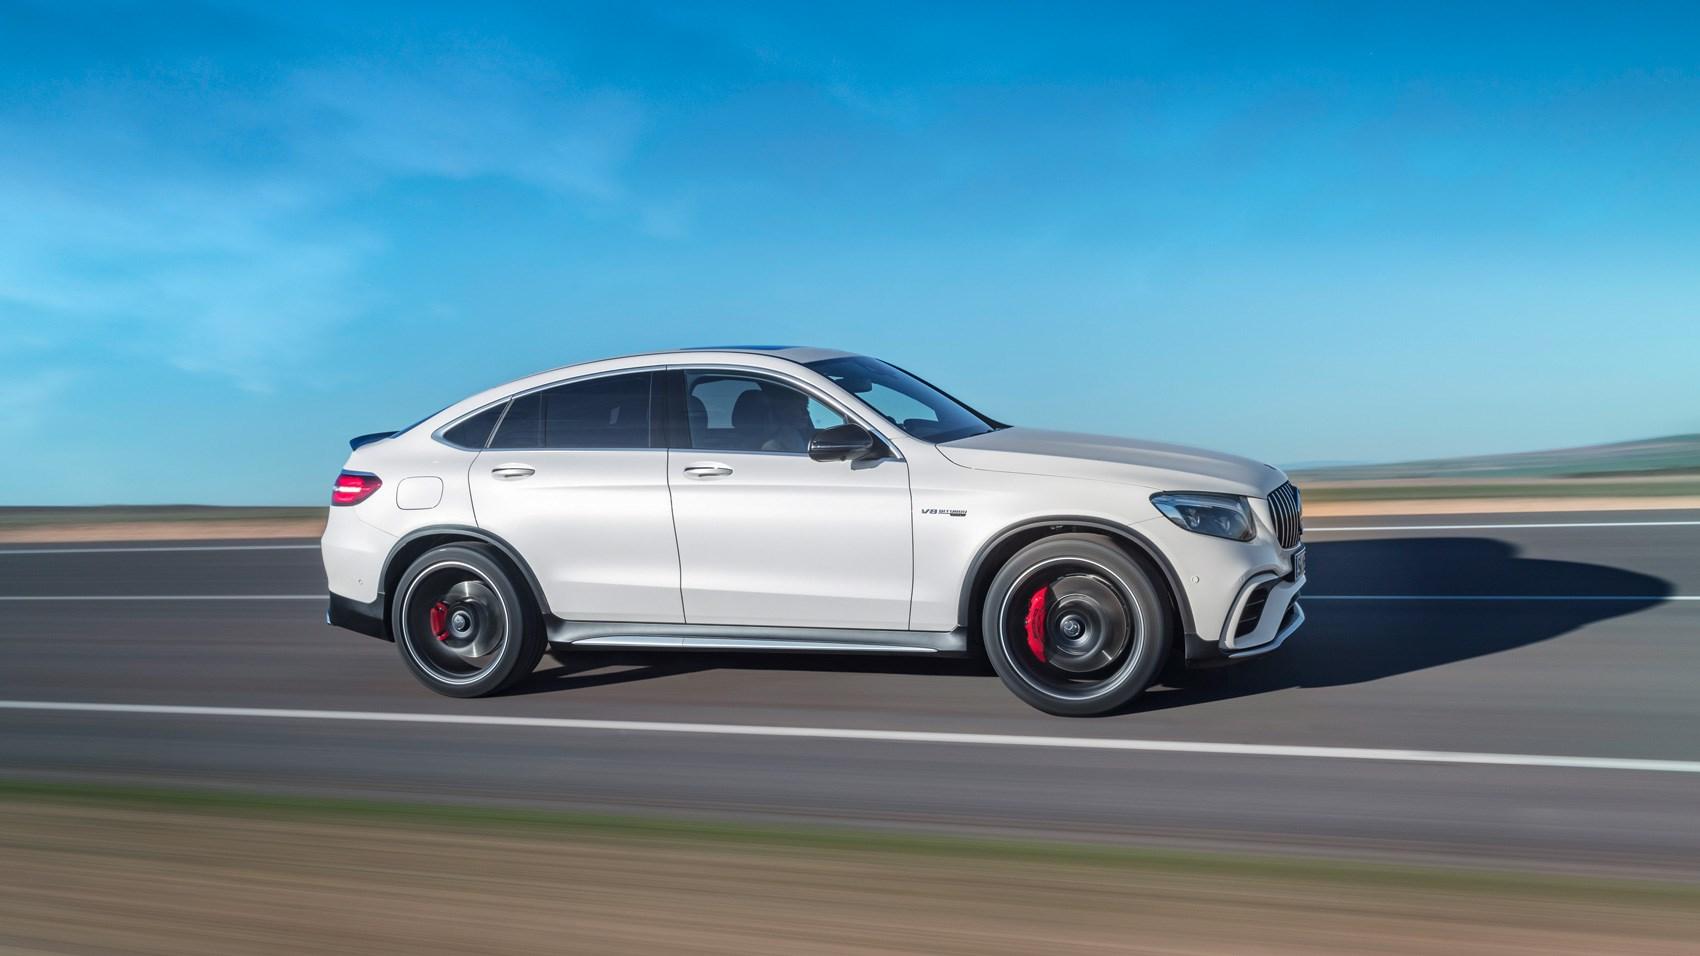 Mercedes Amg Glc63 S Review As Subtle As A Sledgehammer Car Magazine